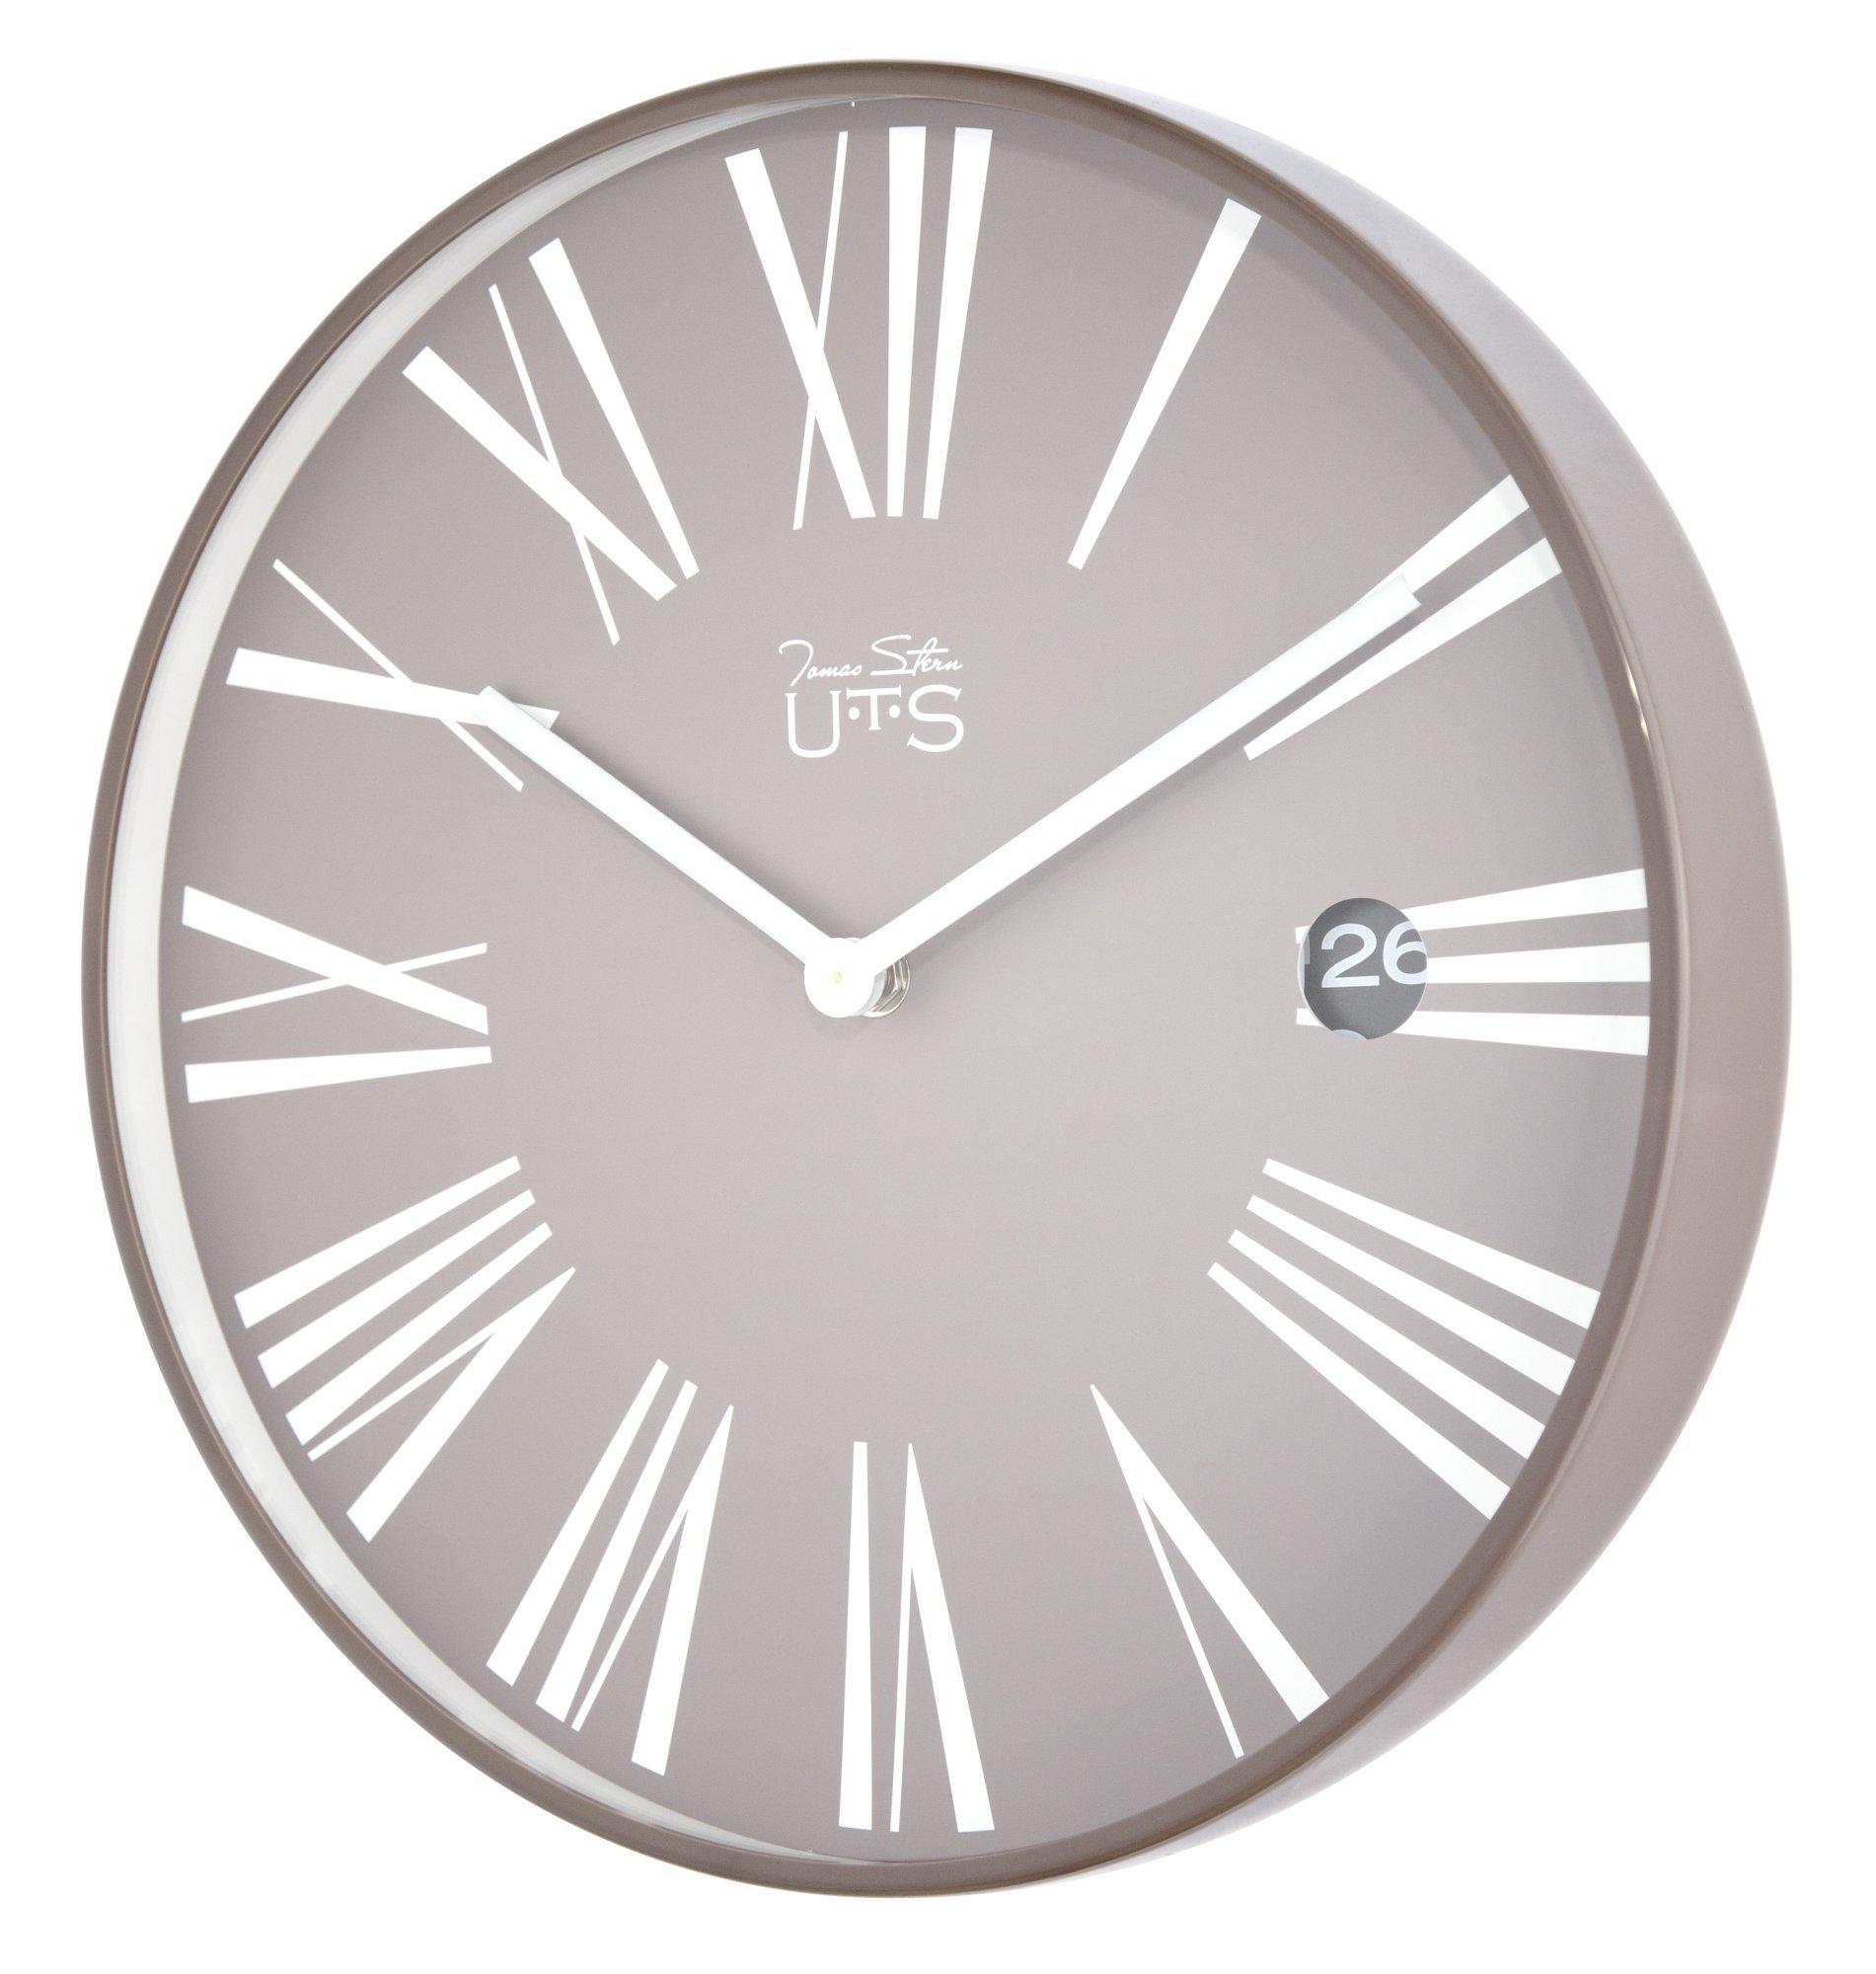 Часы настенные Часы настенные Tomas Stern 4013B chasy-nastennye-tomas-stern-4013b-germaniya.jpg